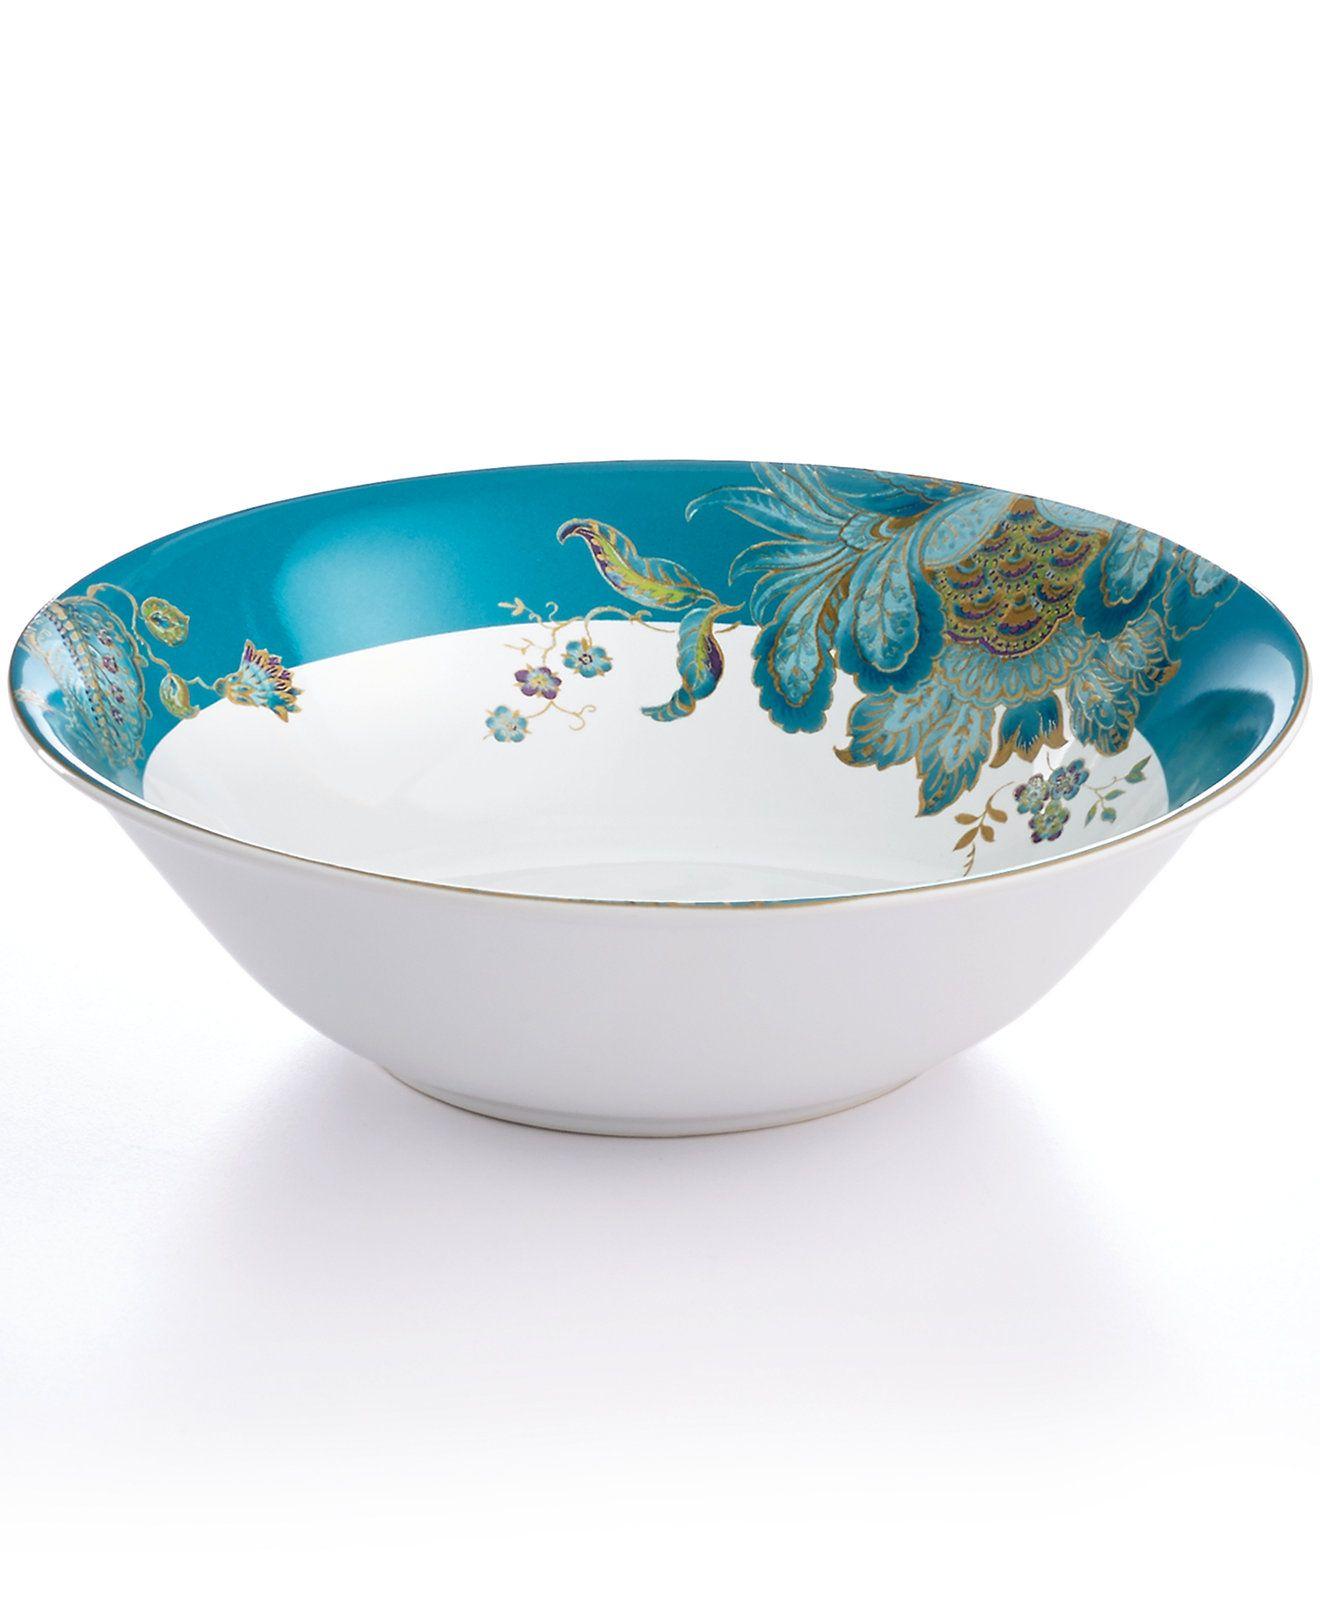 222 Fifth Eliza Teal Round Bowl - Serveware - Dining & Entertaining ...